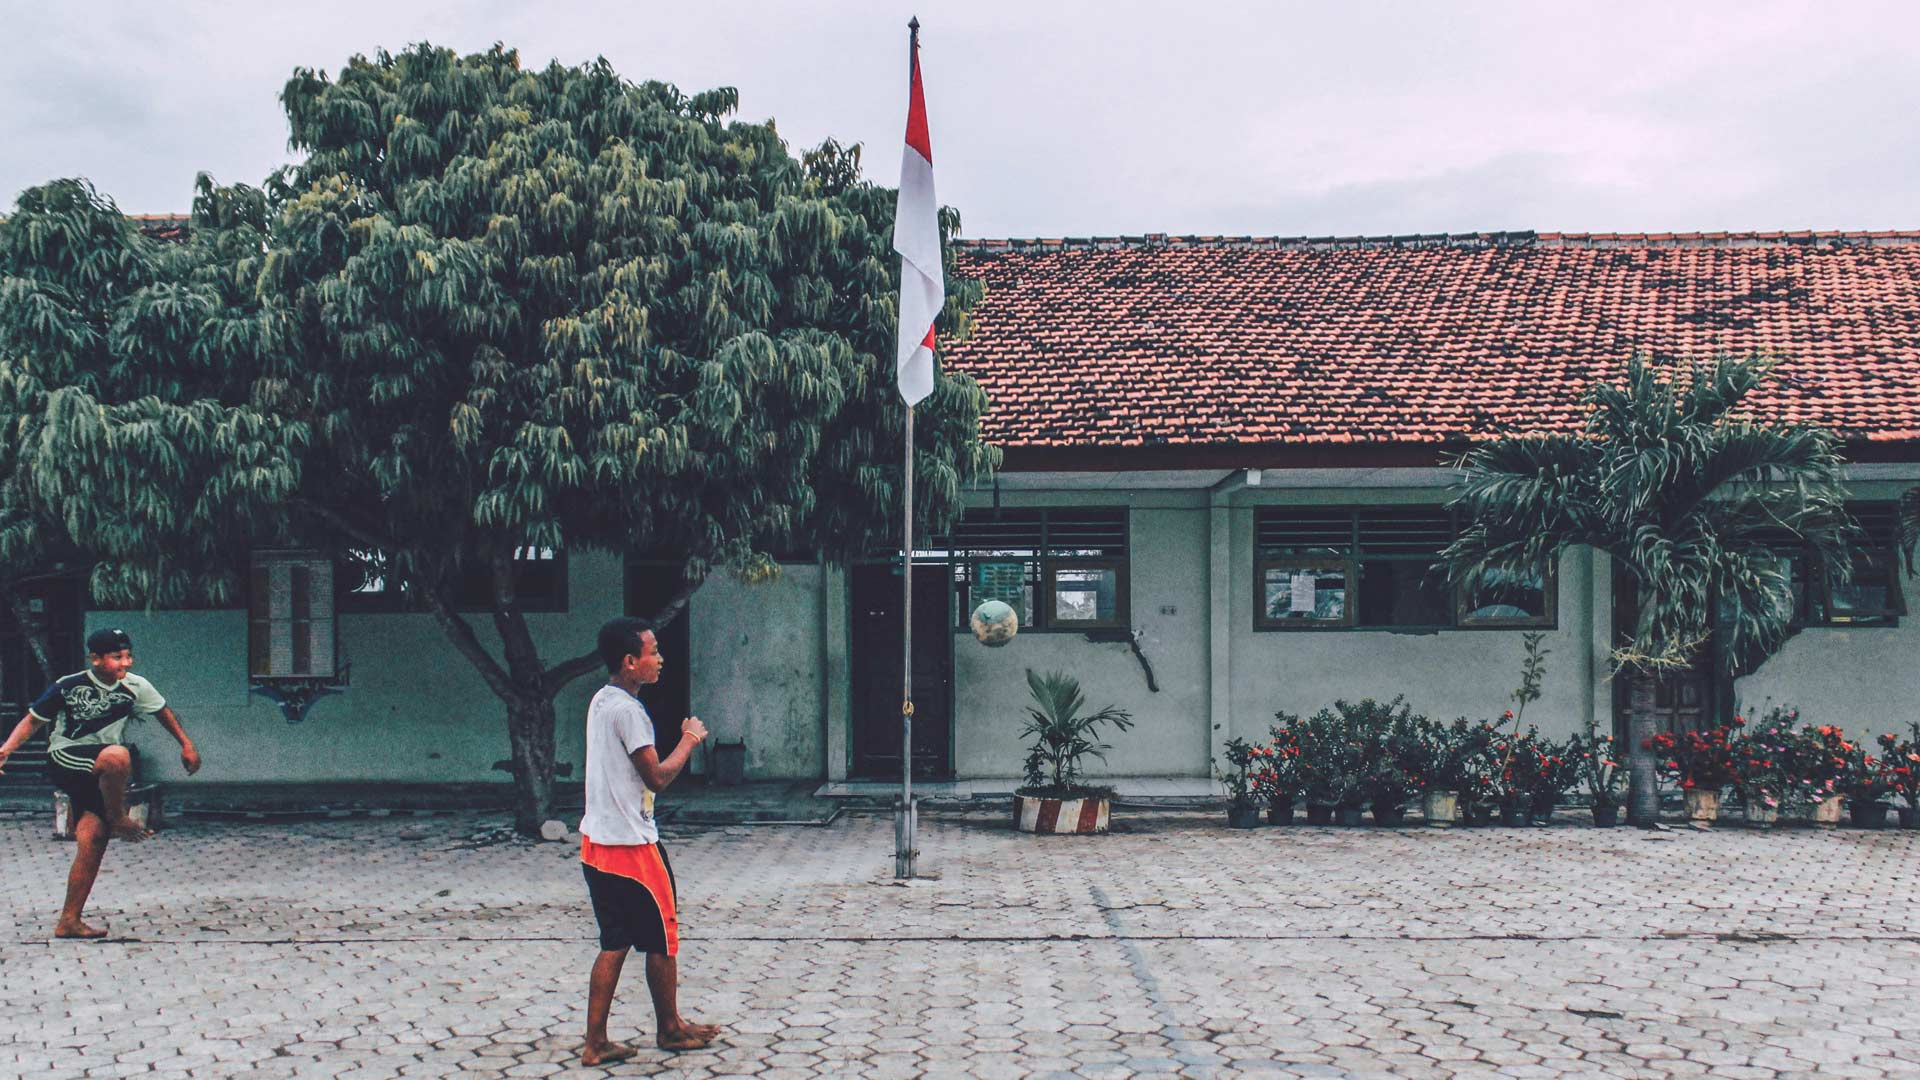 Indonesia street soccer